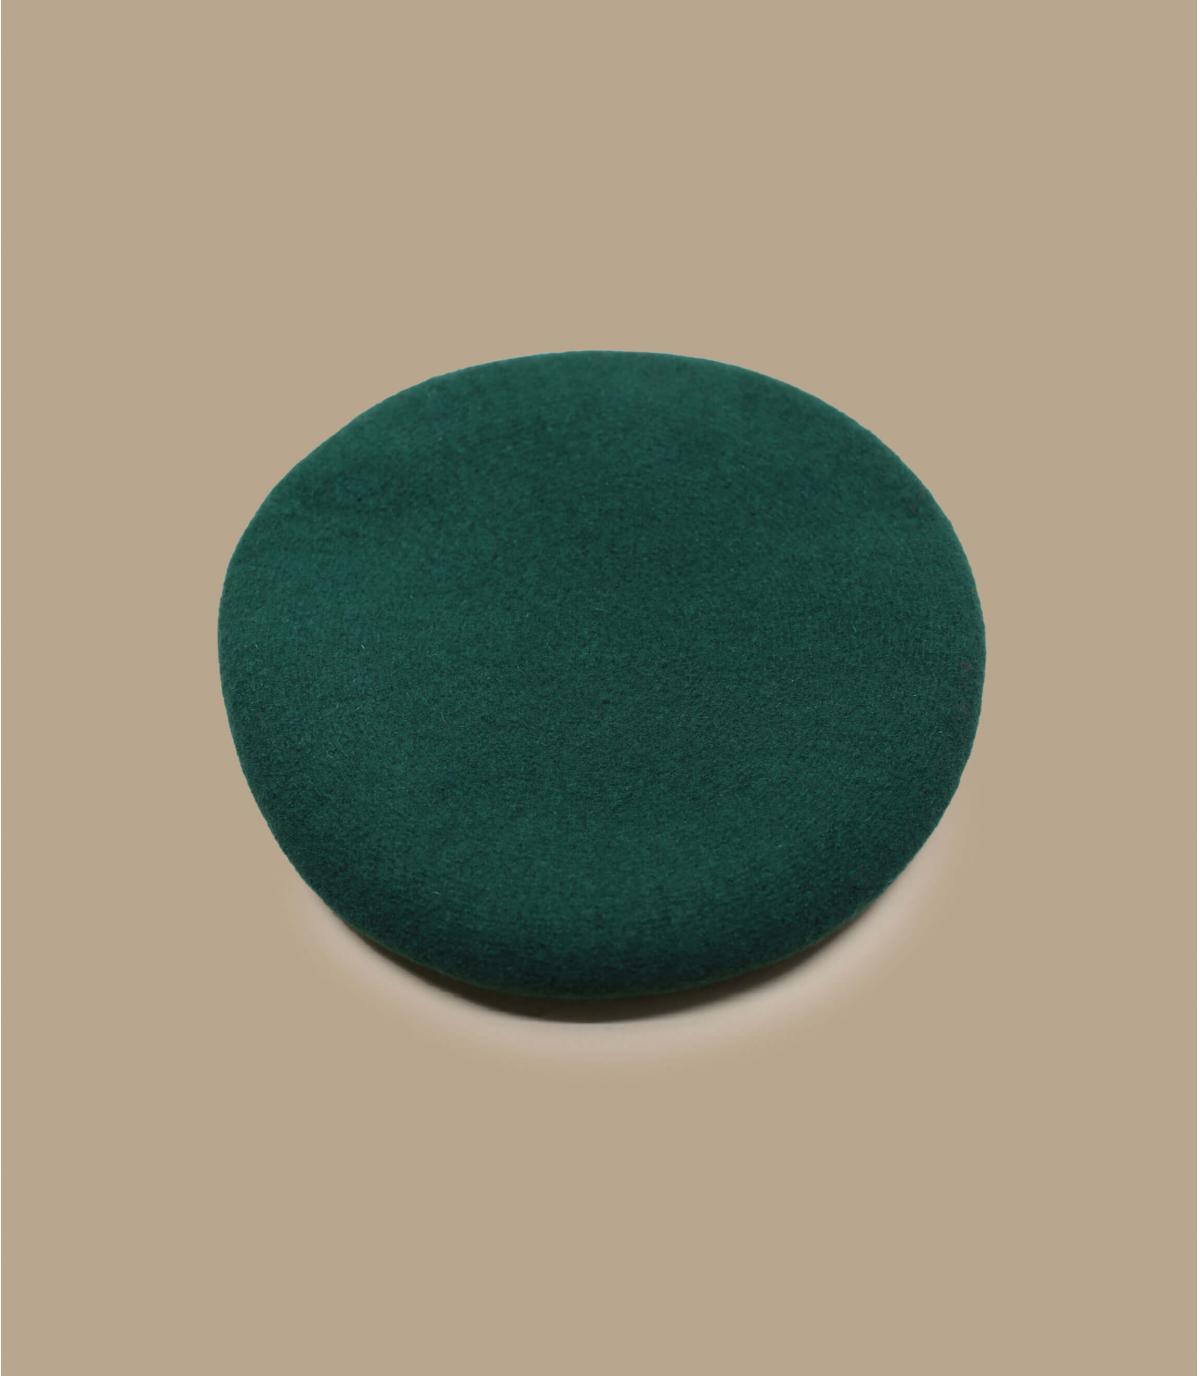 Details Commando Légion Etrangère vert - Abbildung 2